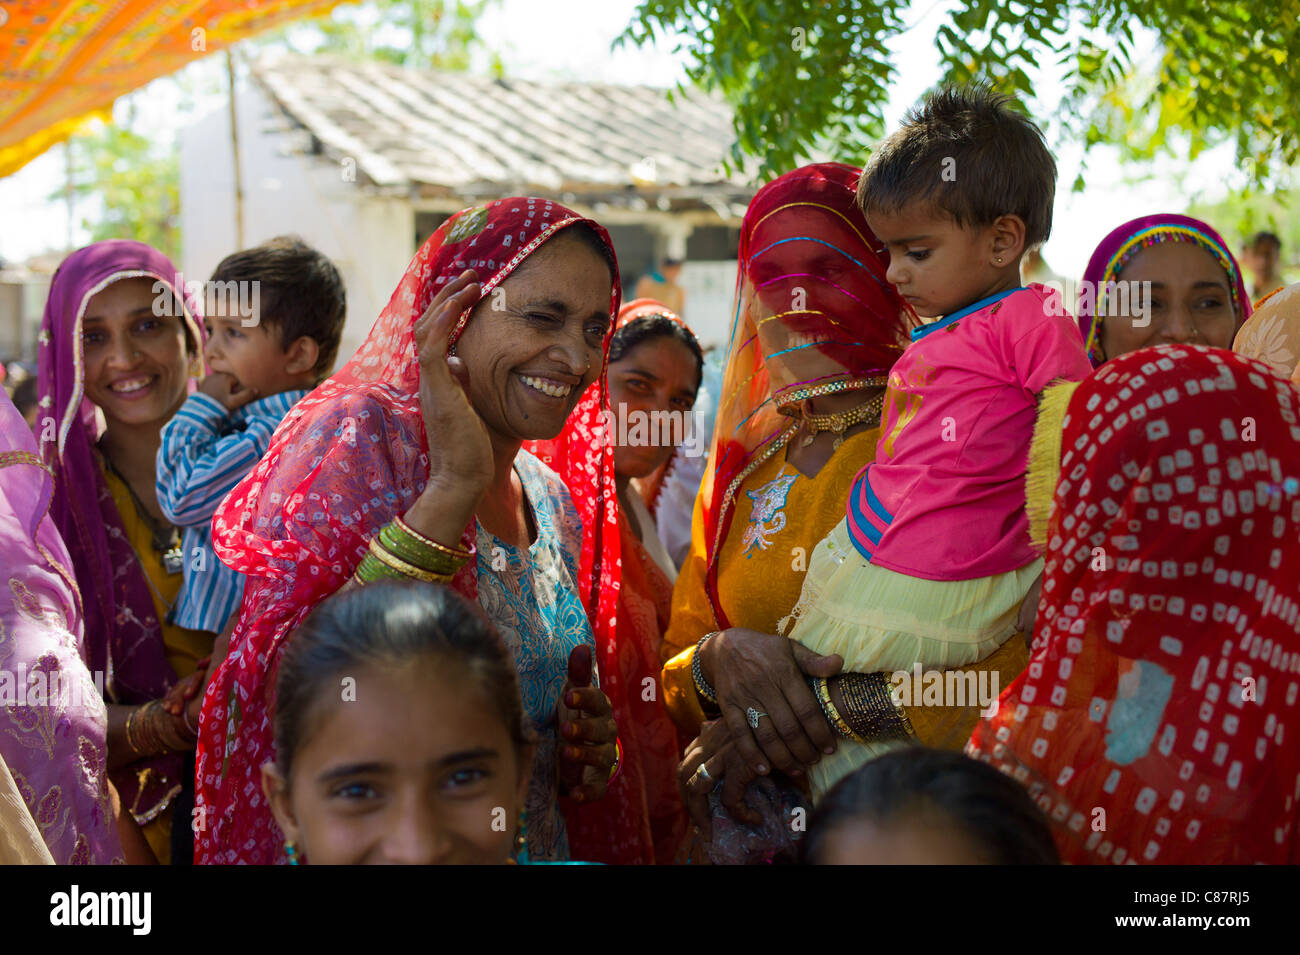 Indian Wedding Stockfotos & Indian Wedding Bilder - Alamy